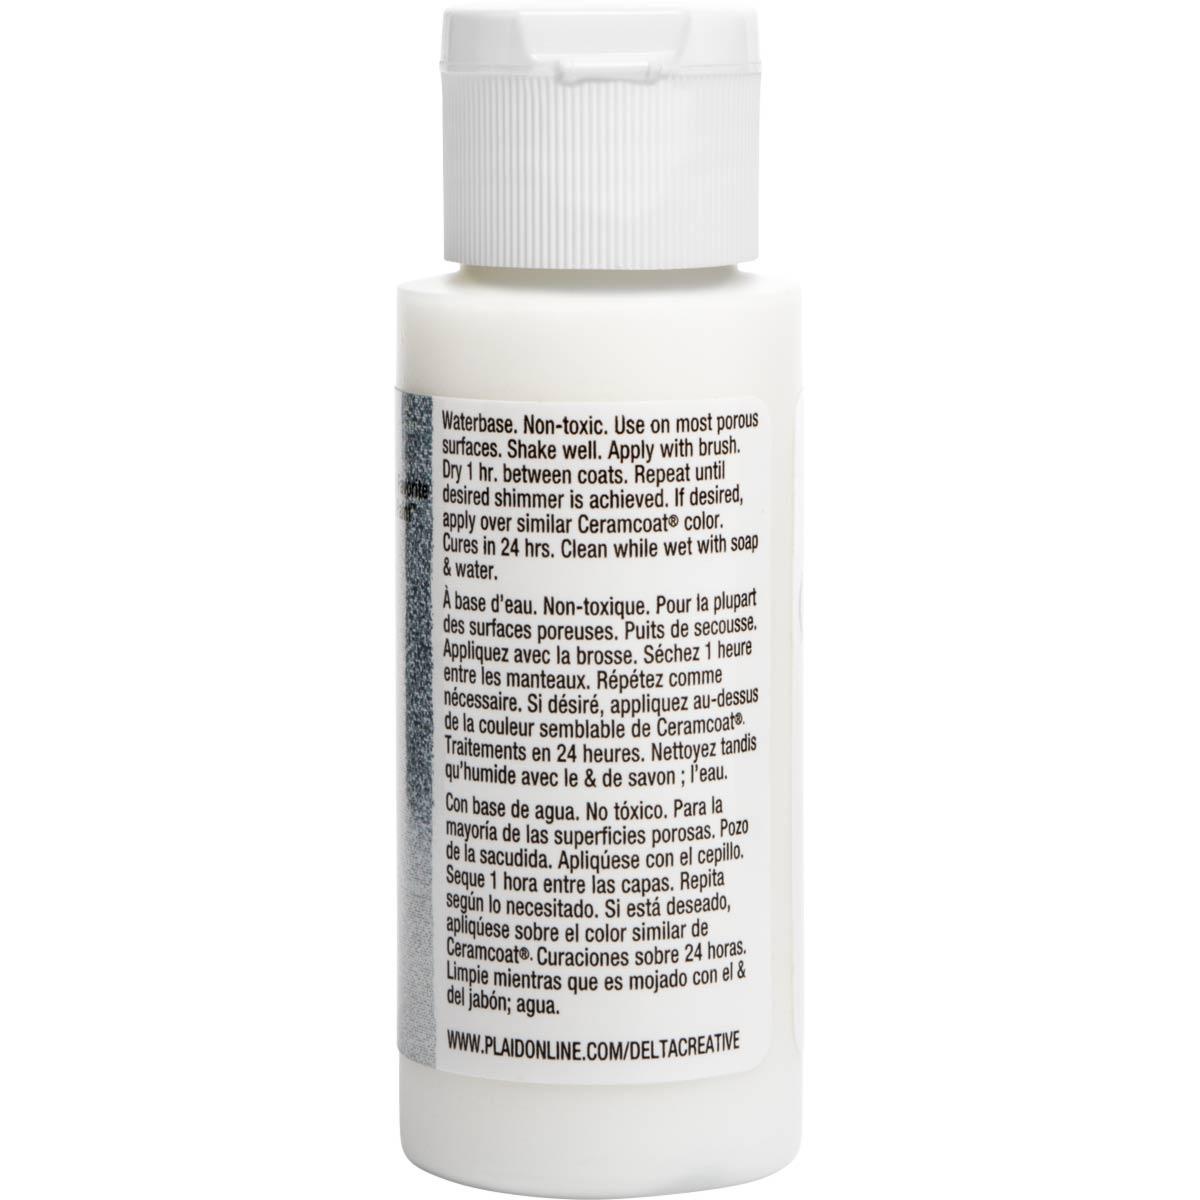 Delta Ceramcoat ® Acrylic Paint - Glitter Ice, 2 oz. - 03001